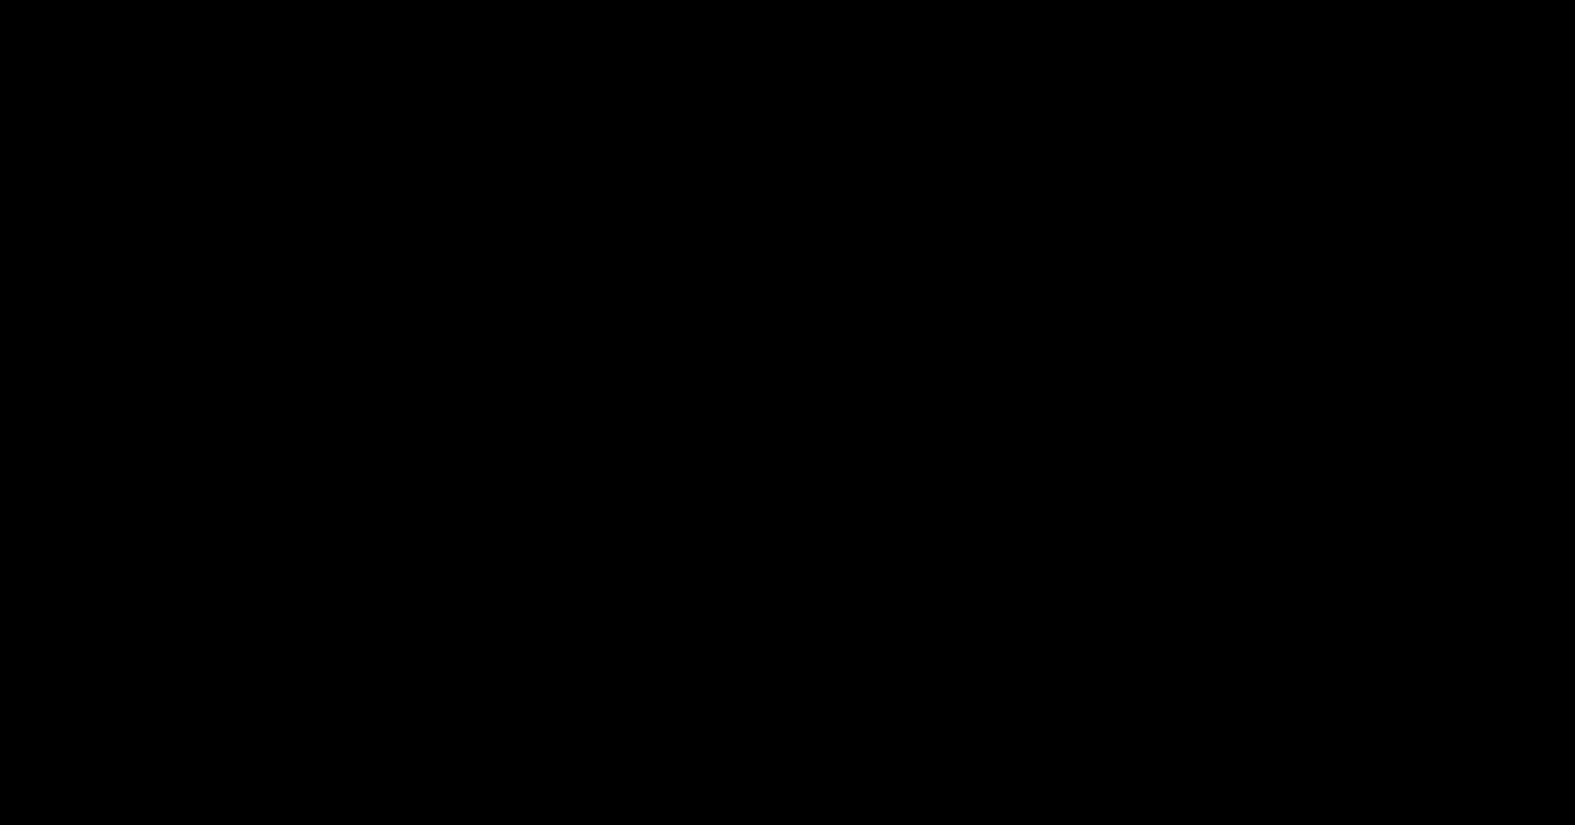 Asus-Logo-PNG-Download-Image